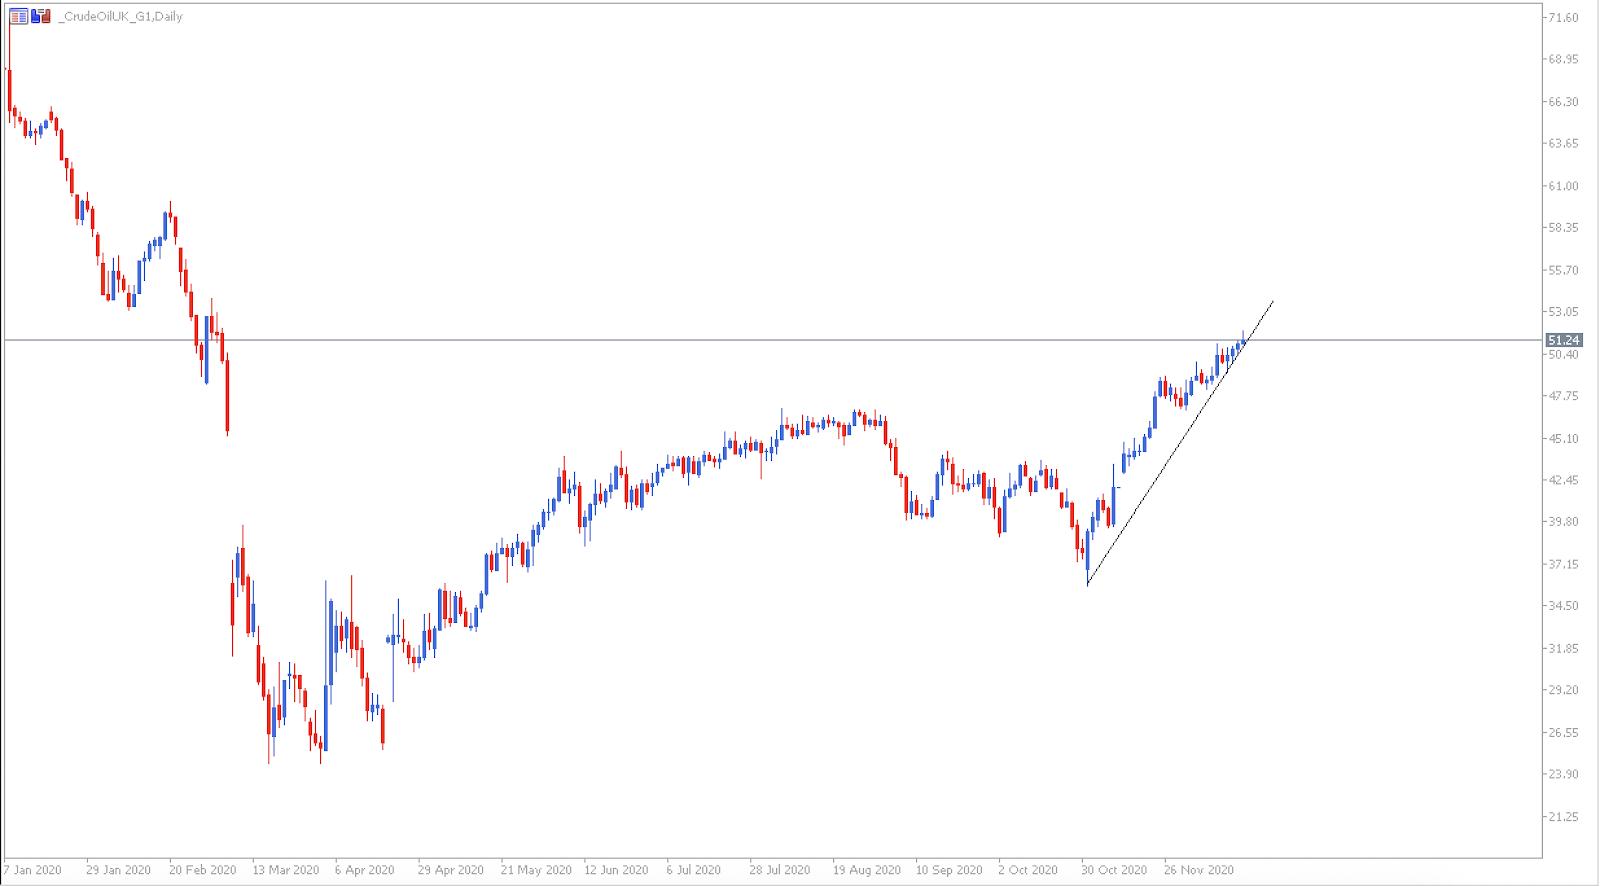 График рынка нефти марки Brent